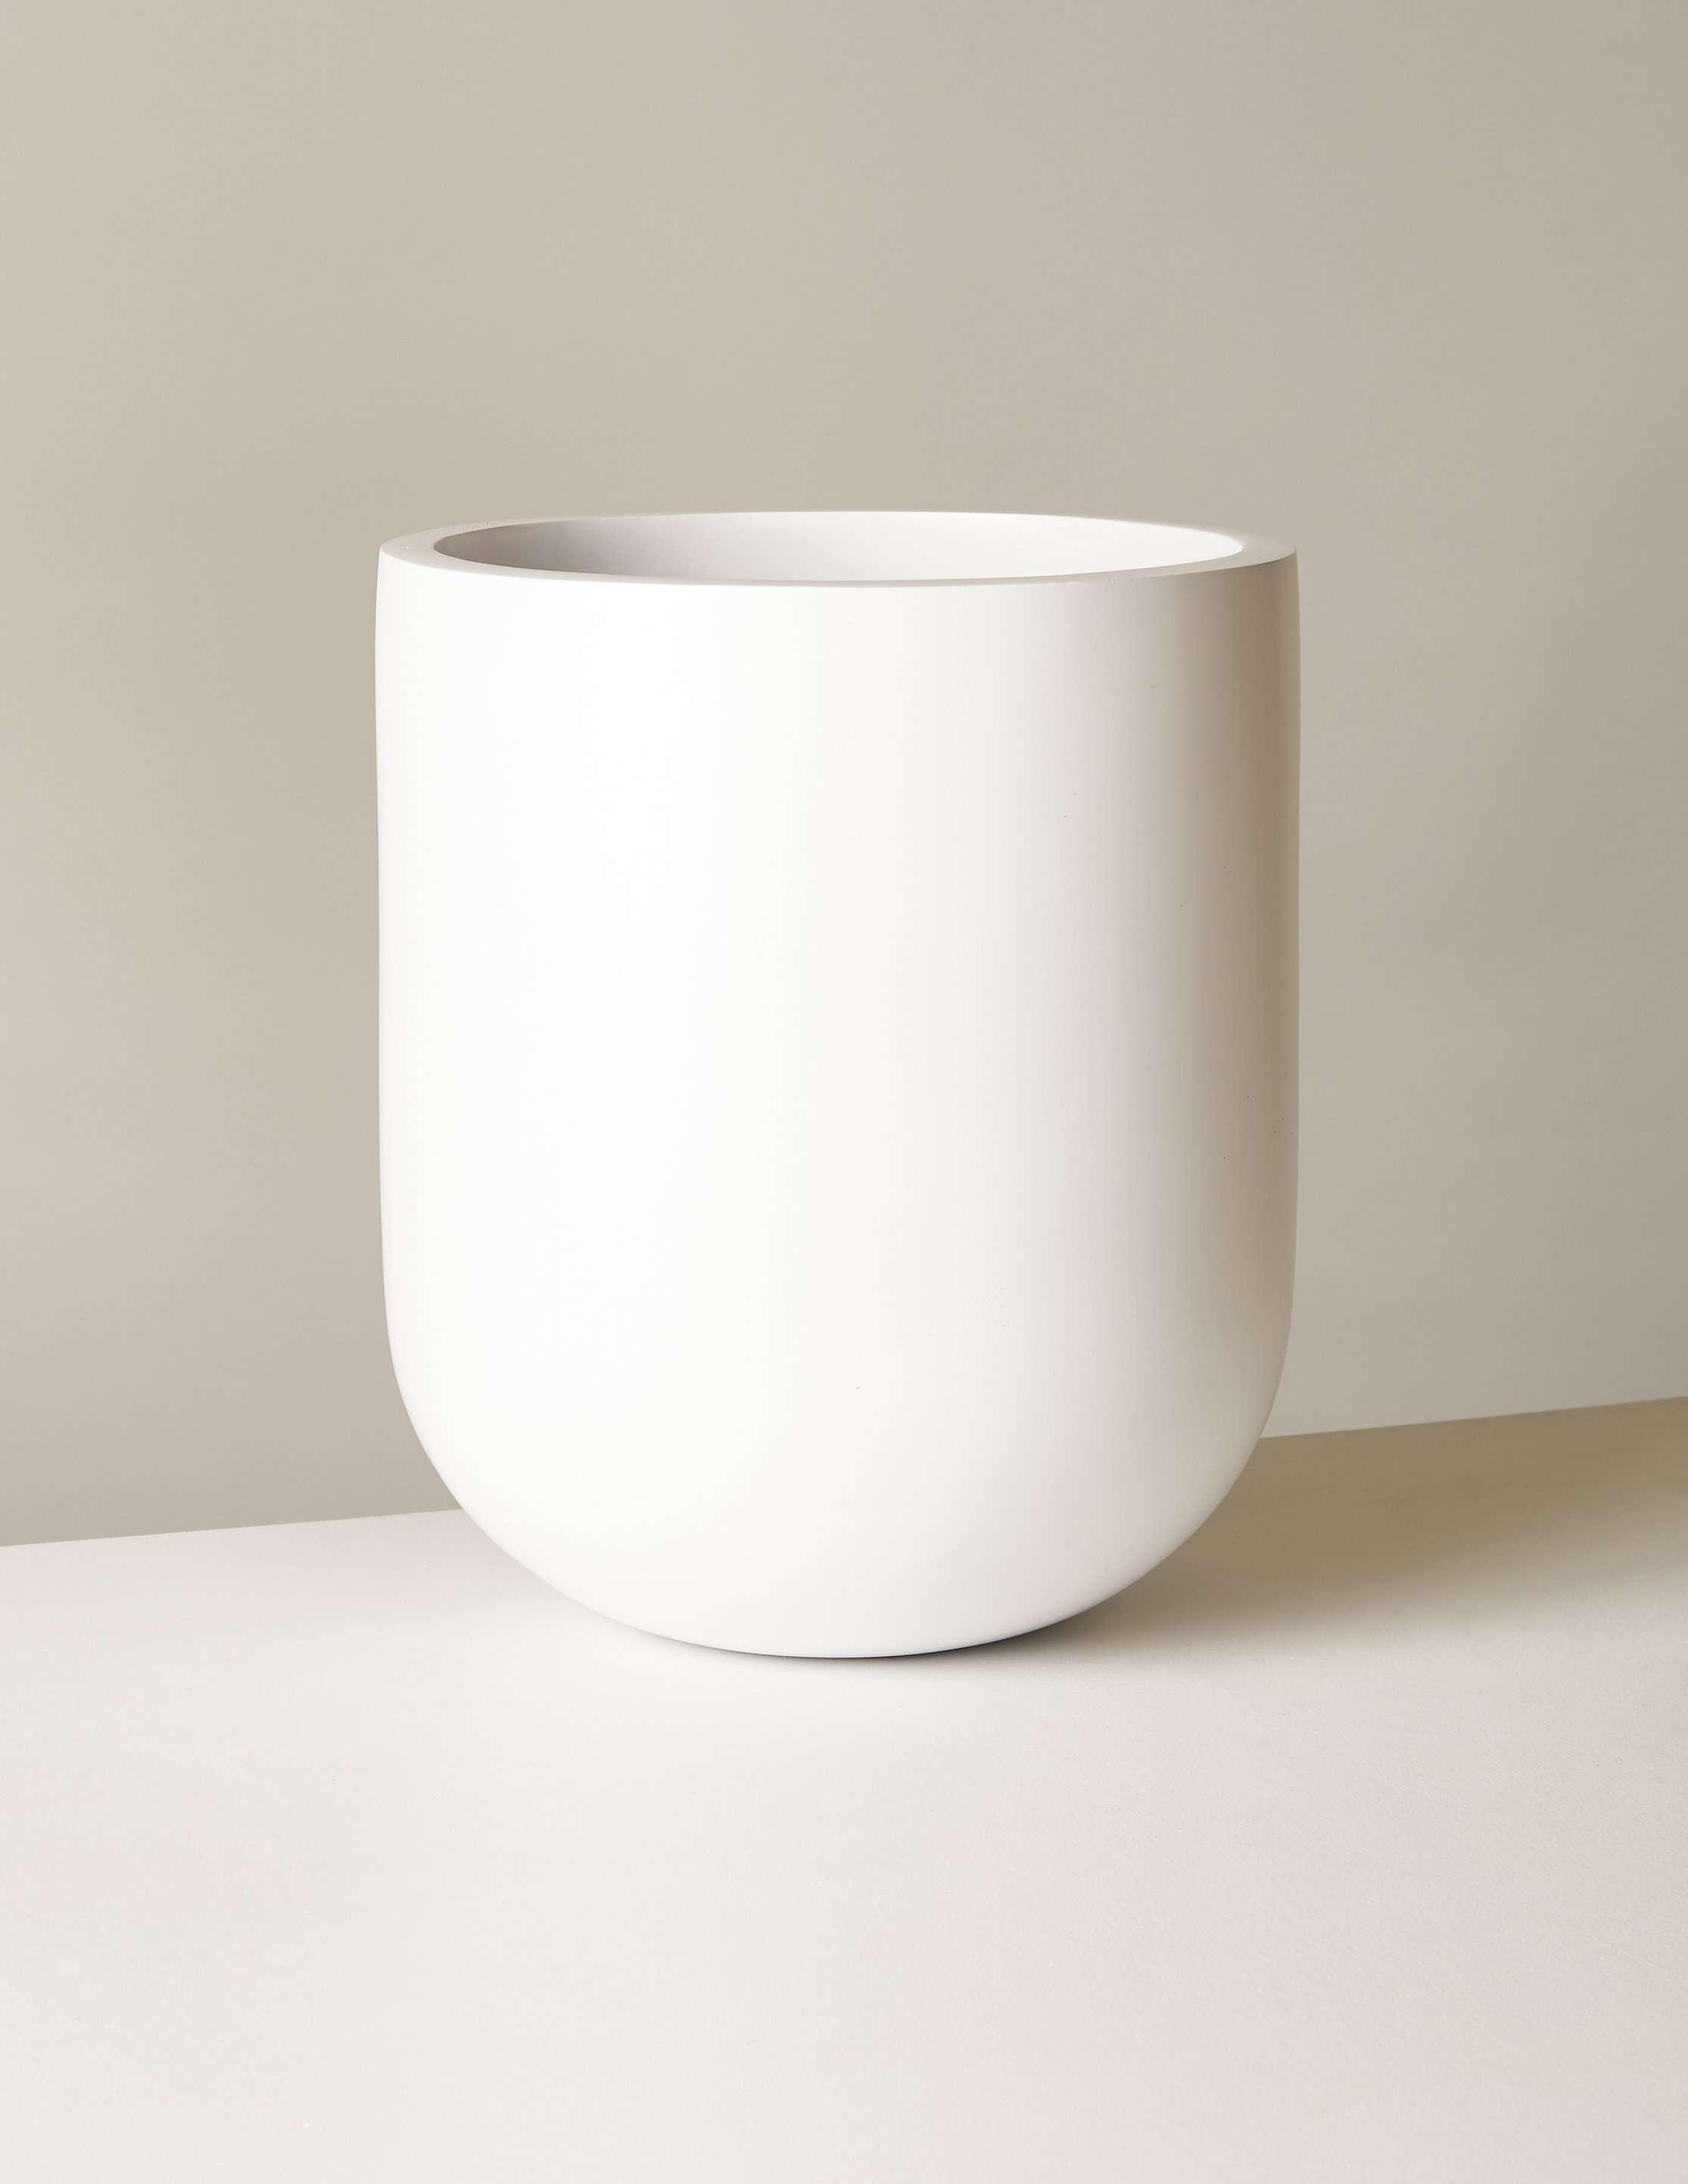 A large white fiberglass planter.